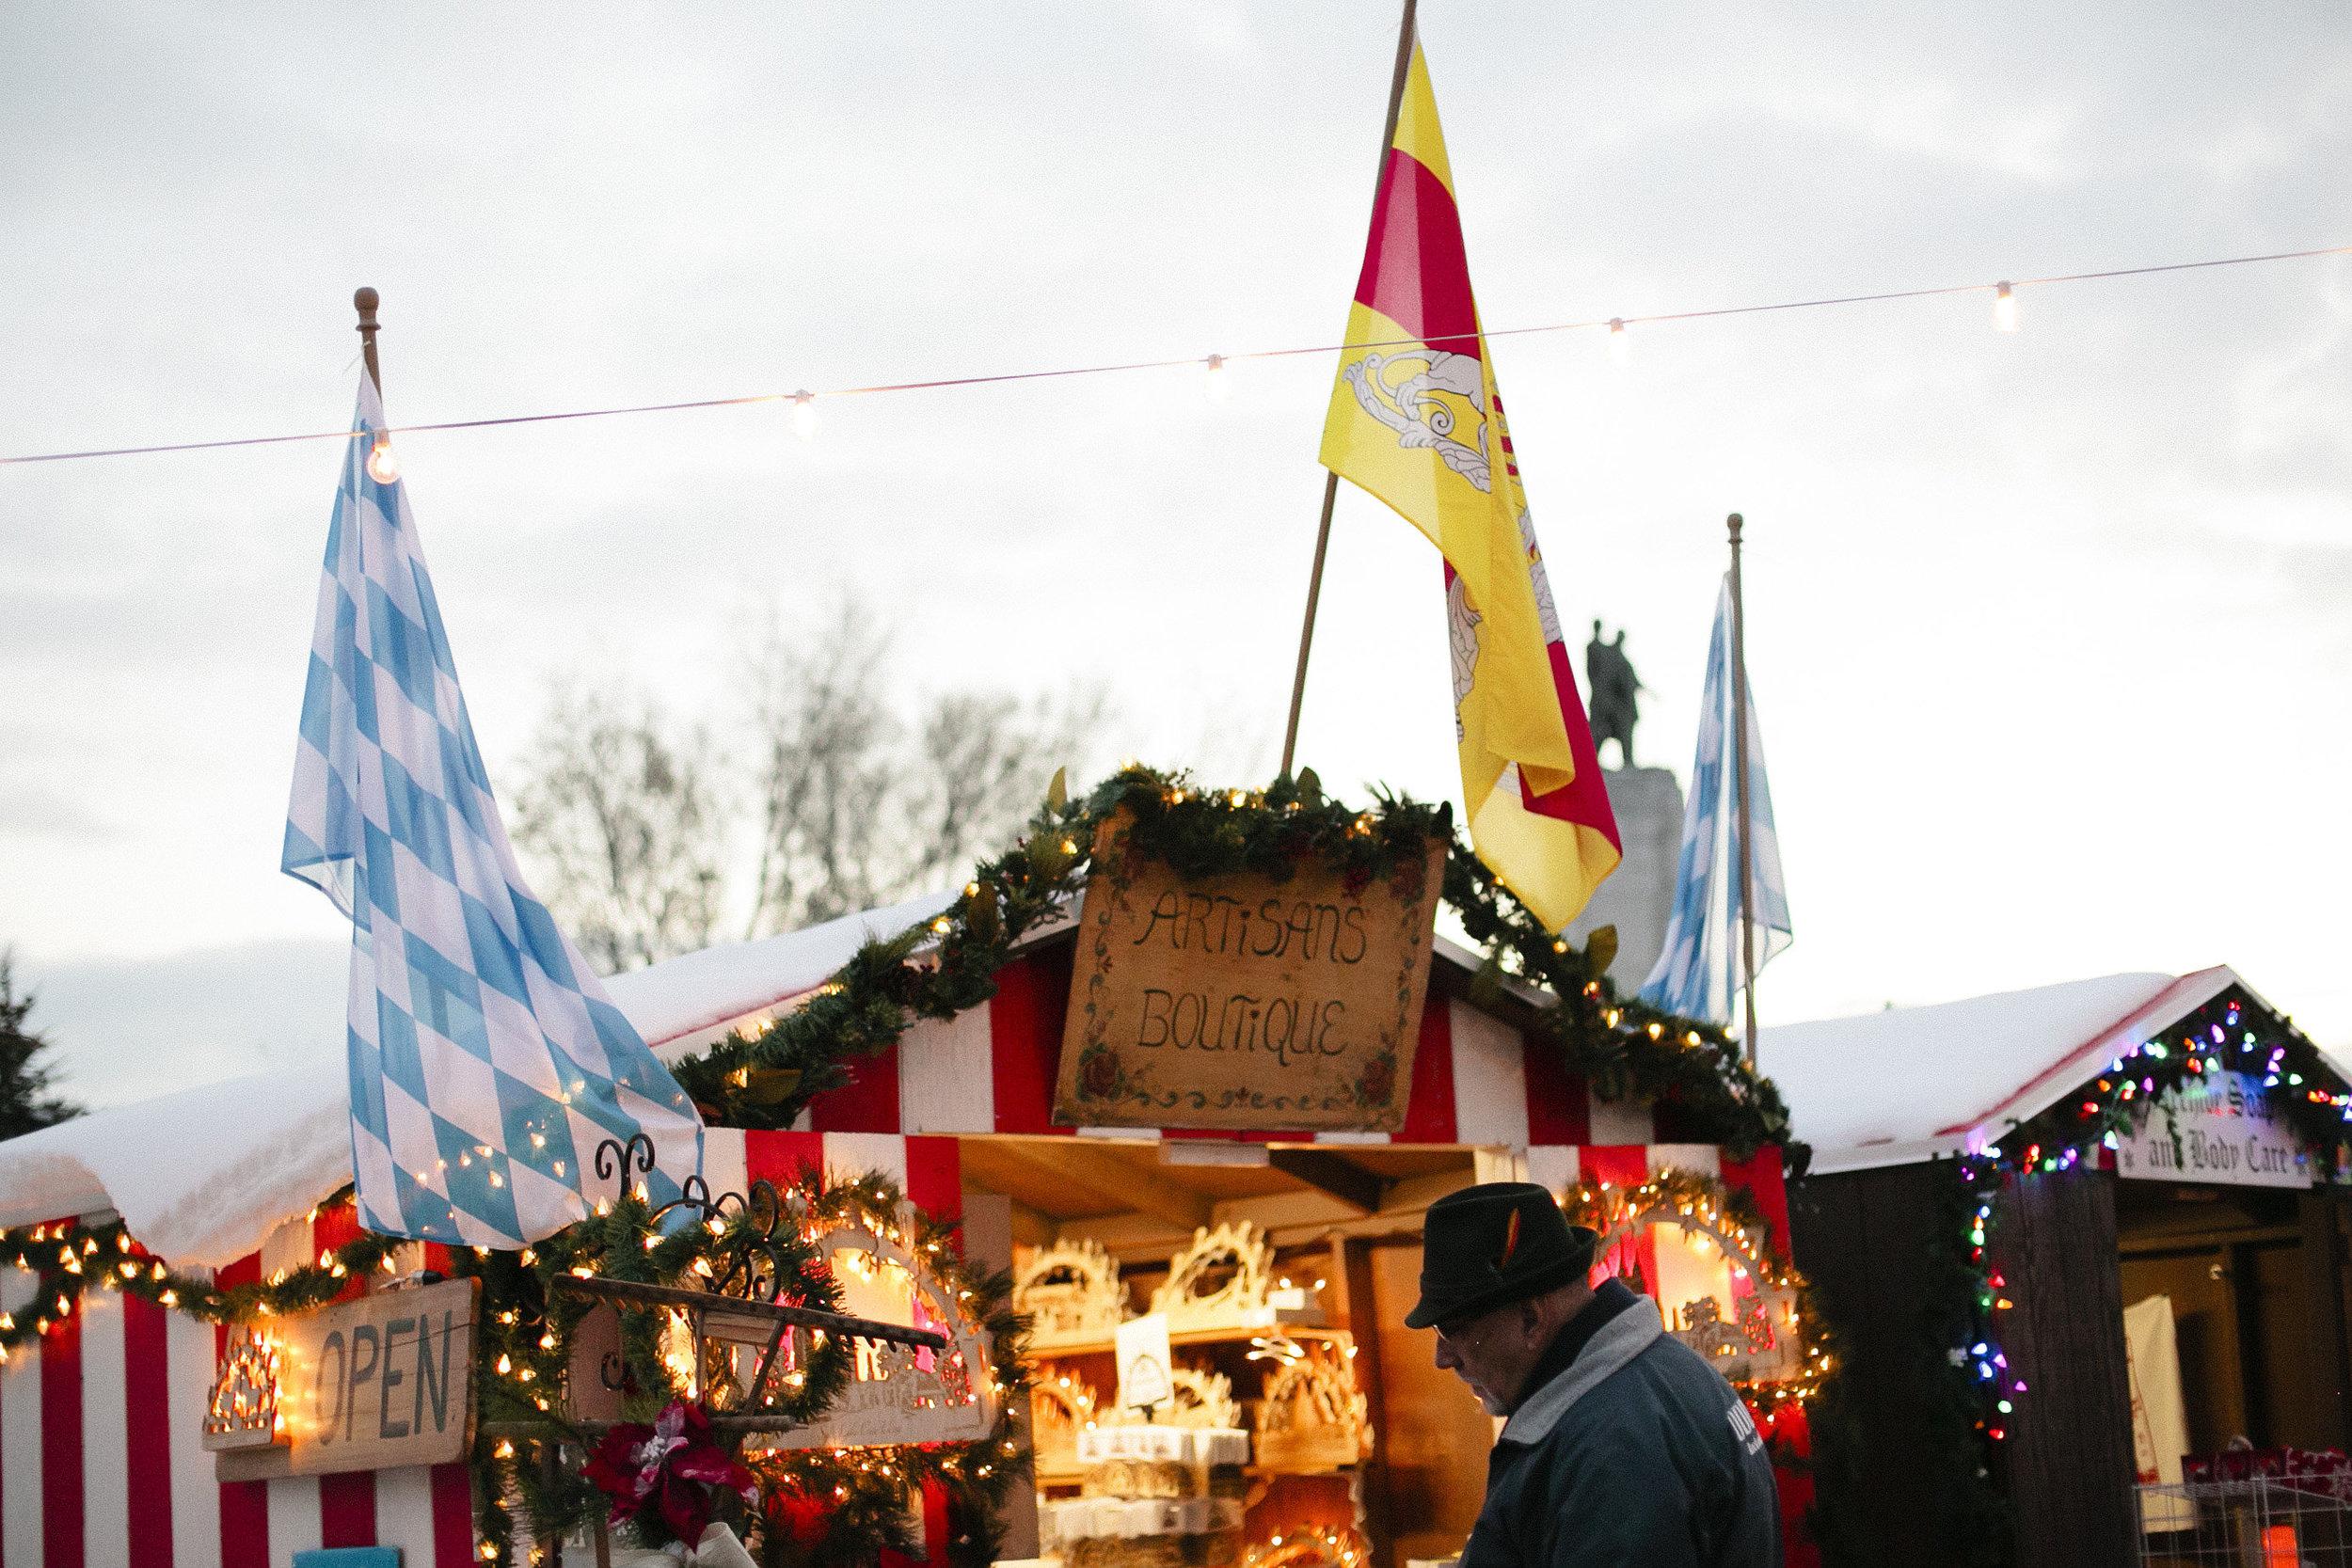 201612_christkindlmarkt4.jpg